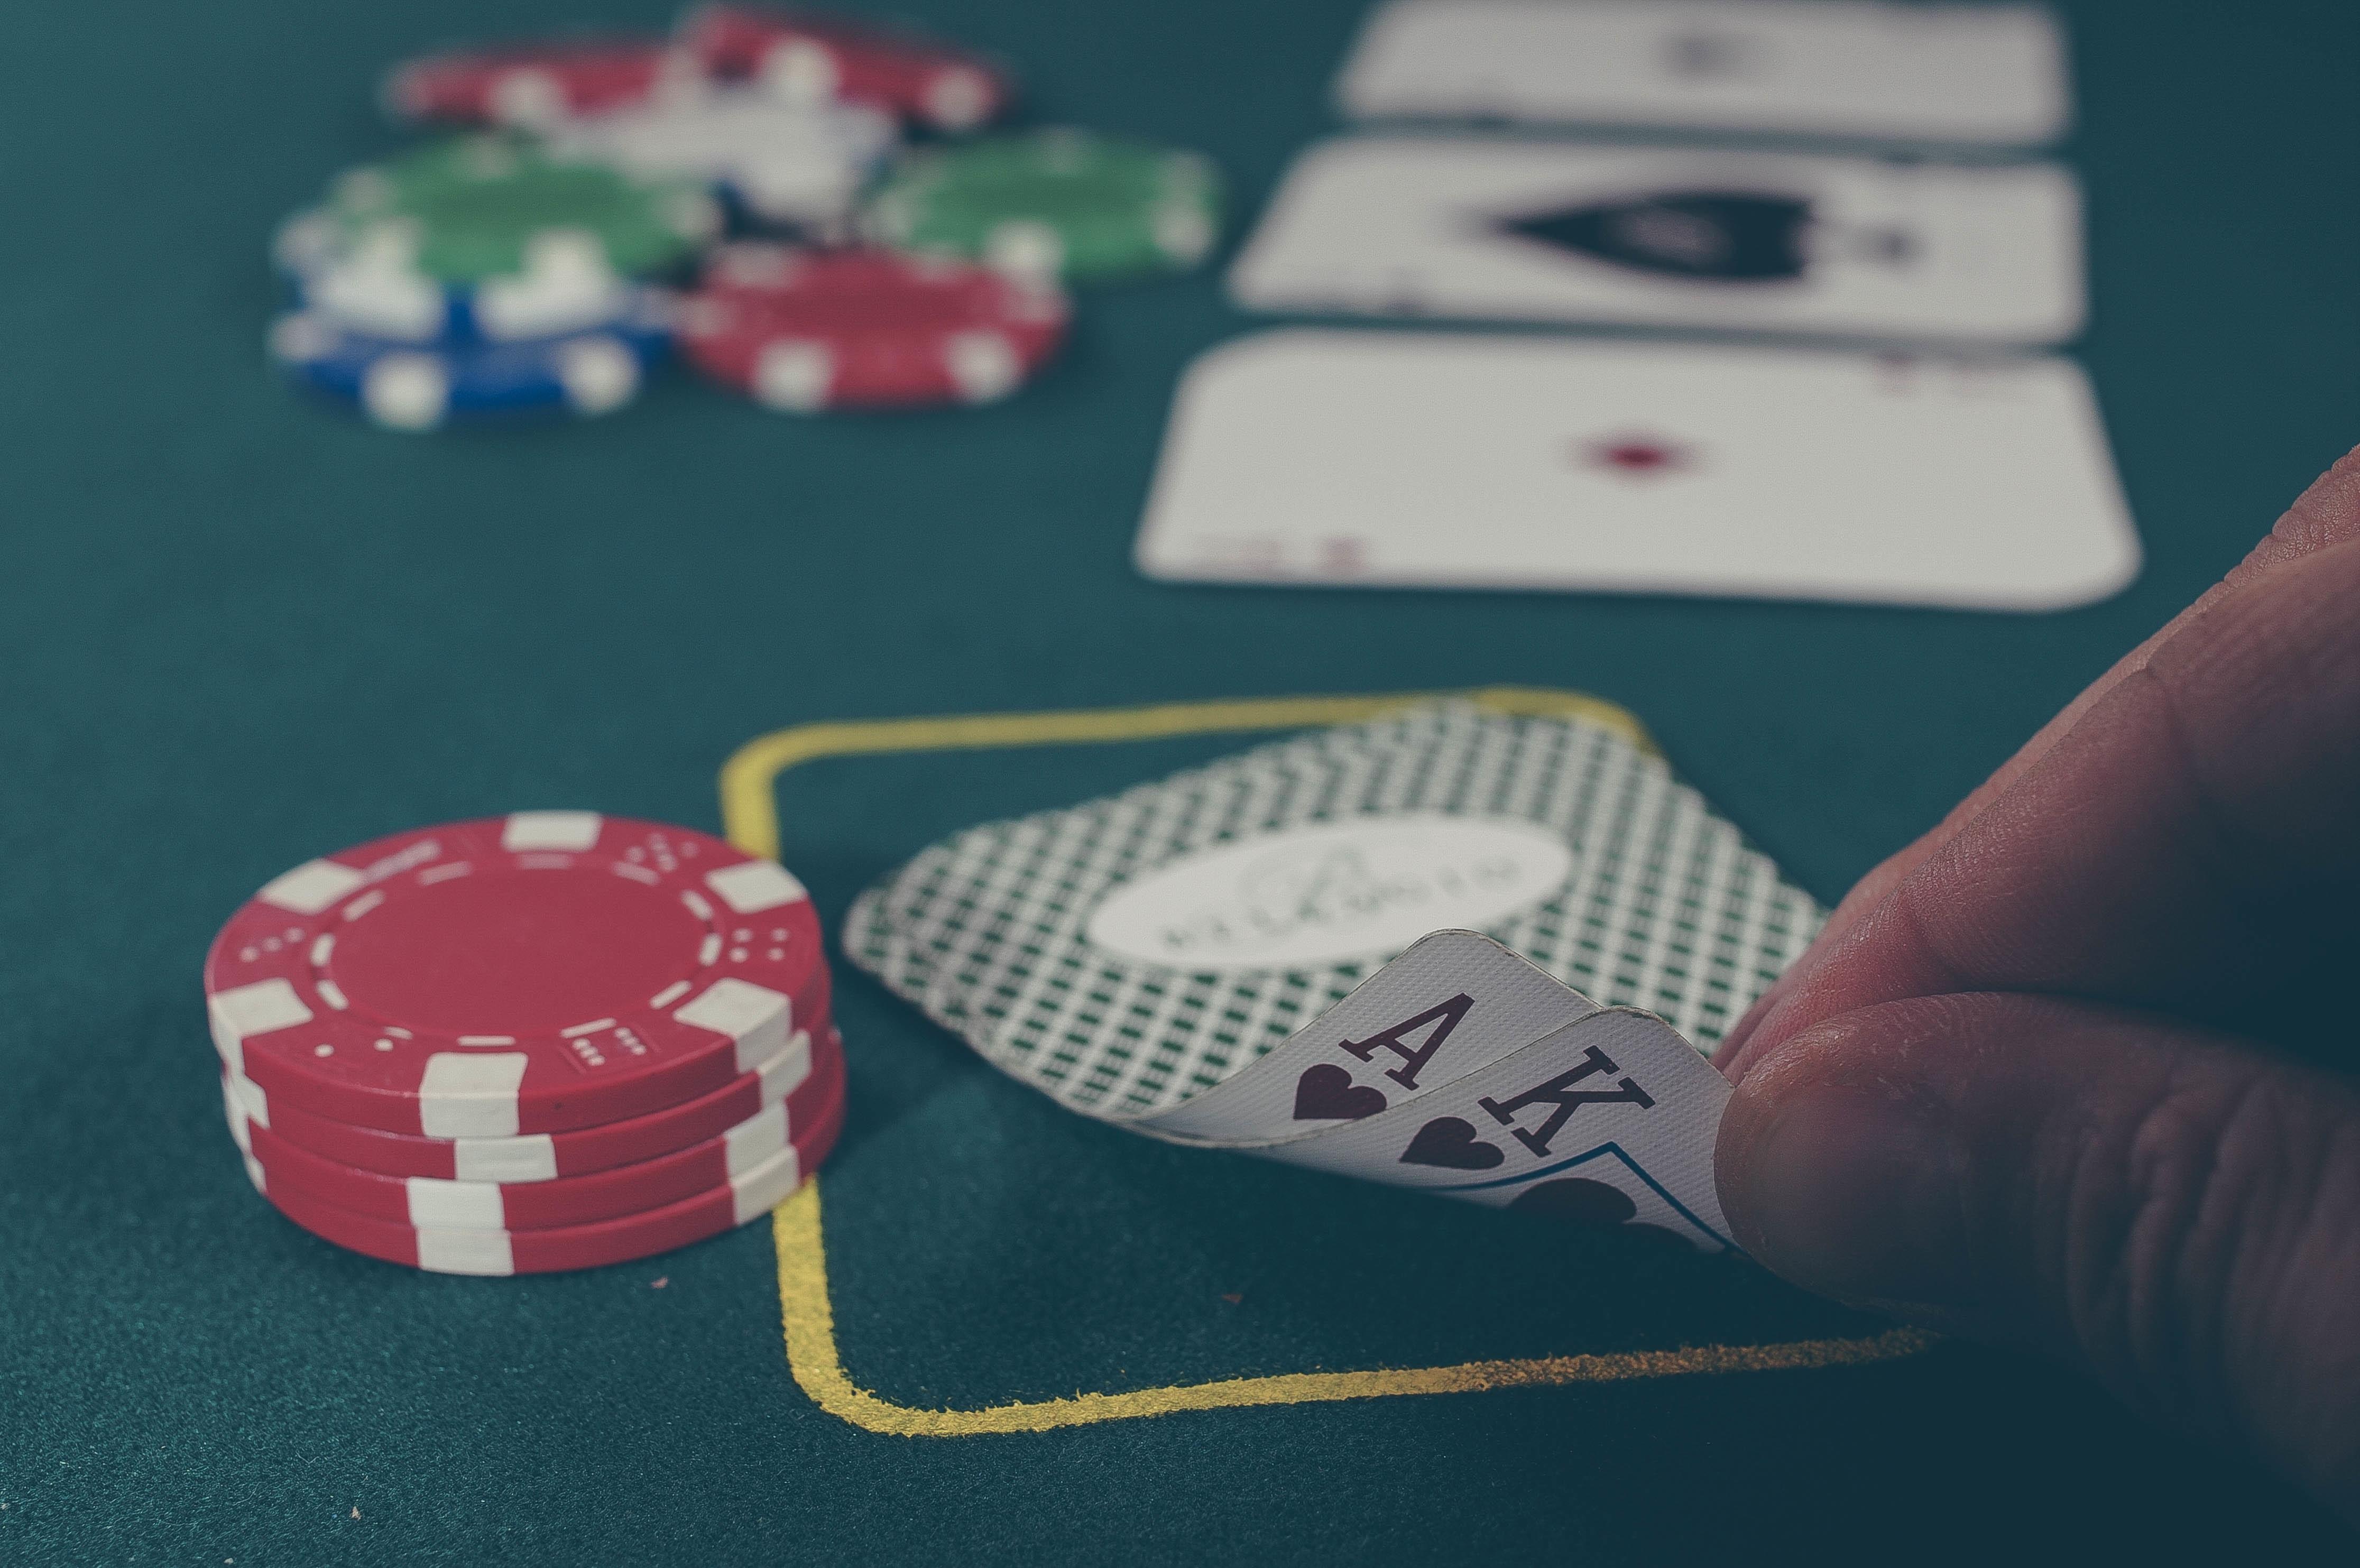 Casino Cards Chips Poker Gambling Blackjack Recreation Games Card Game